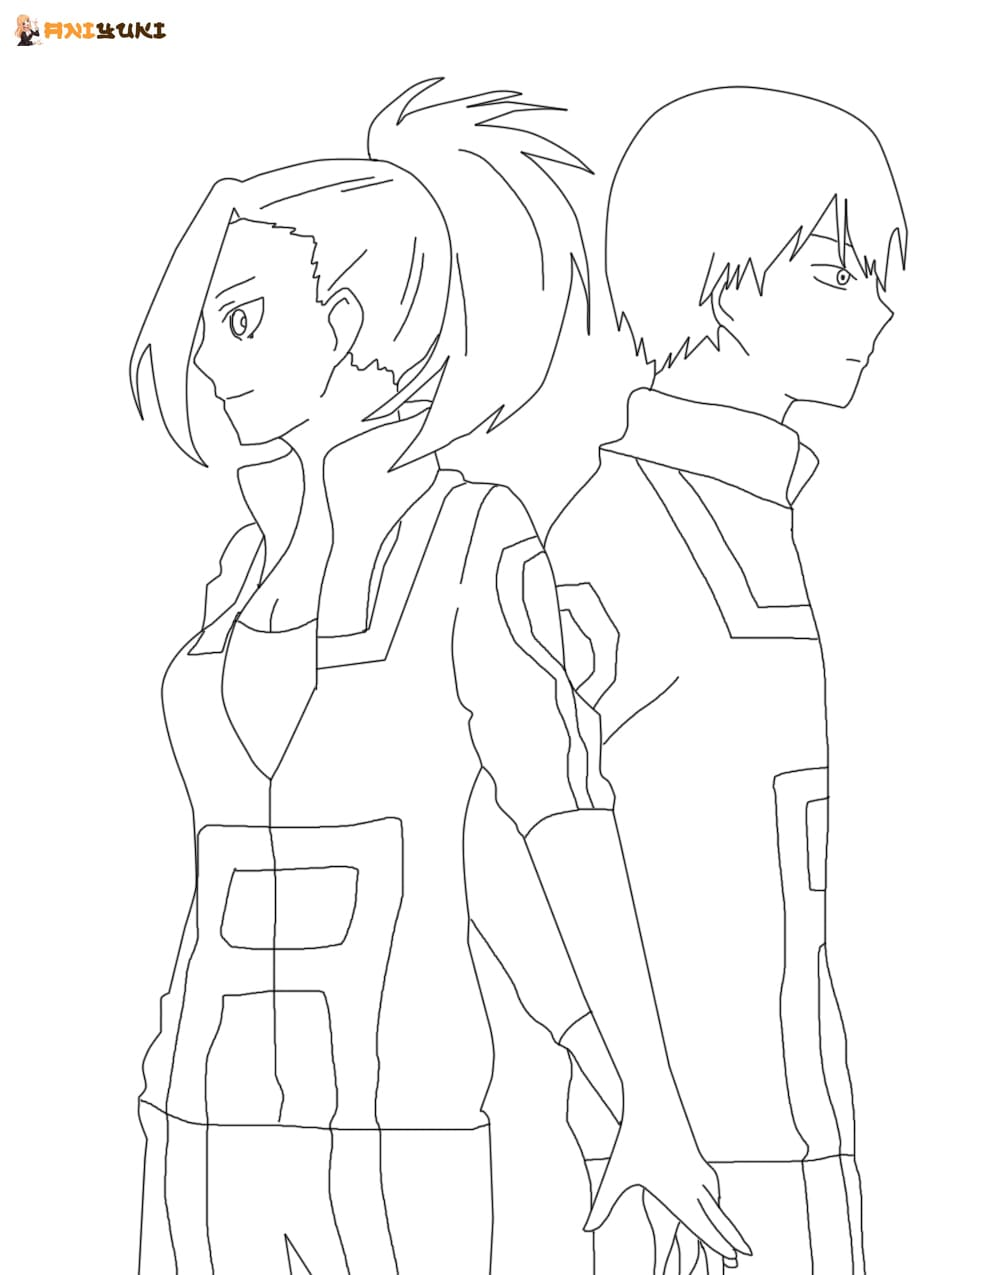 Ausmalbilder Momo Yaoyorozu - AniYuki - Anime Portal